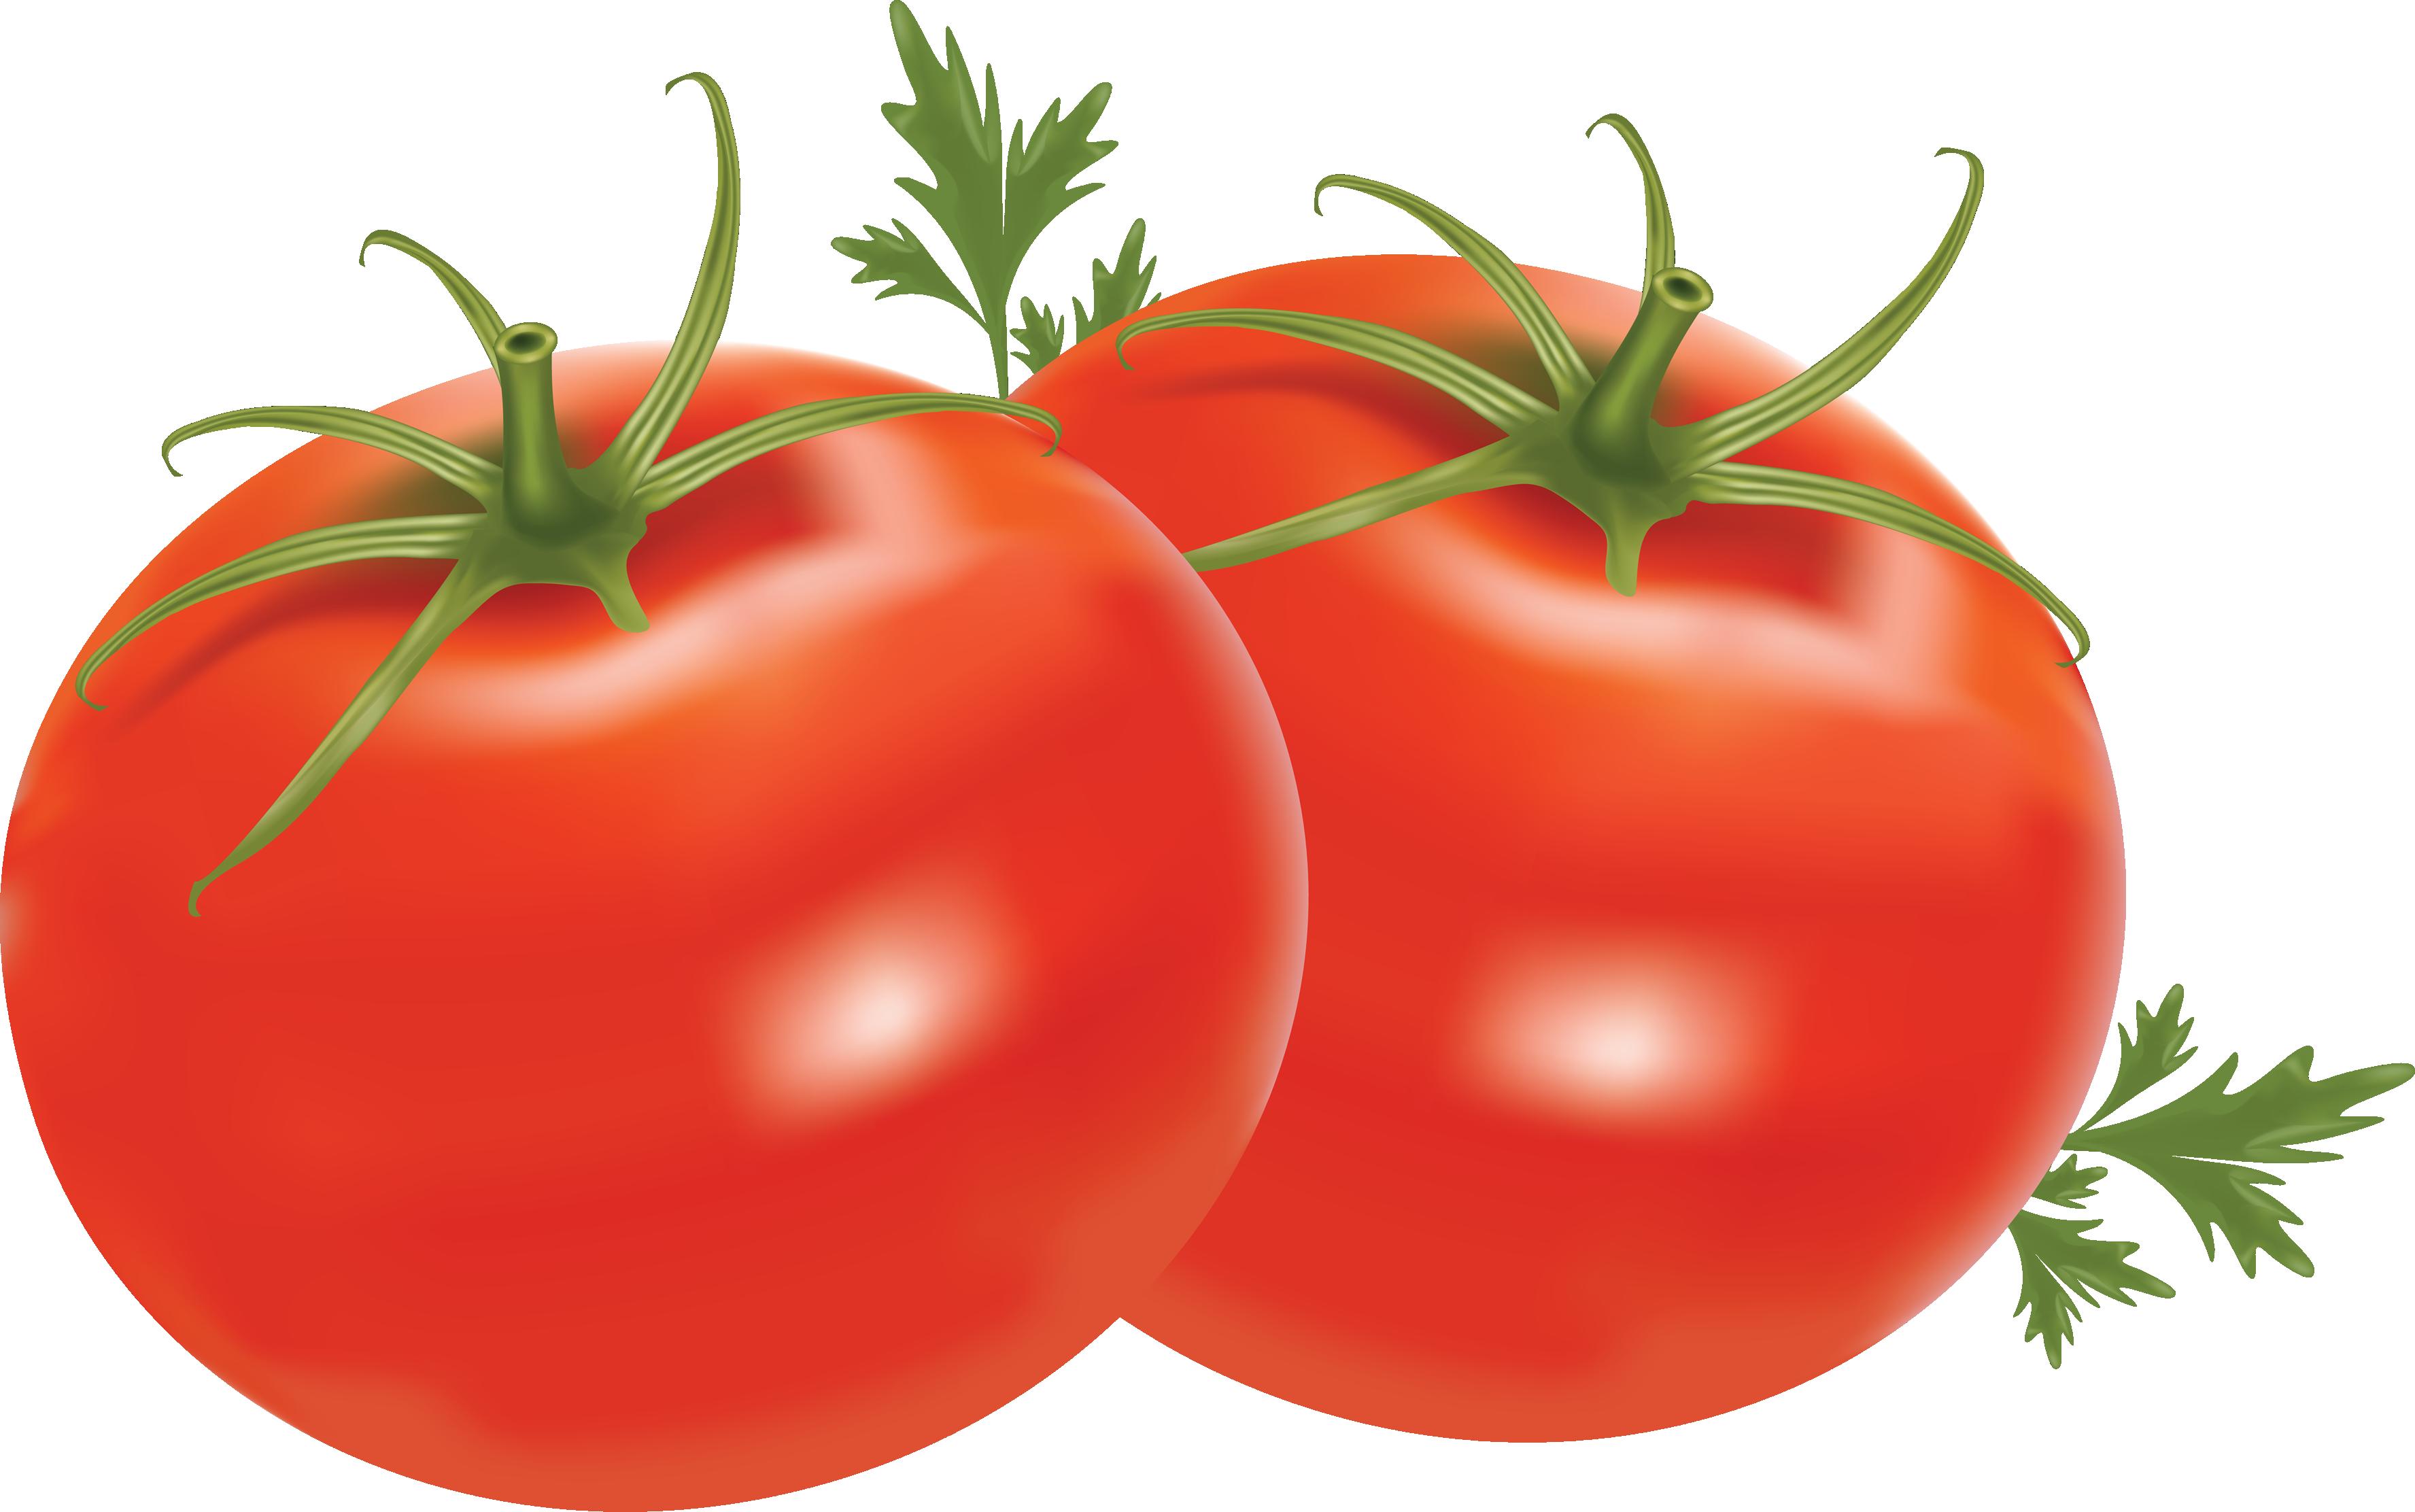 Red Tomatoes Png Image Red Tomato Tomato Tomato Benefits